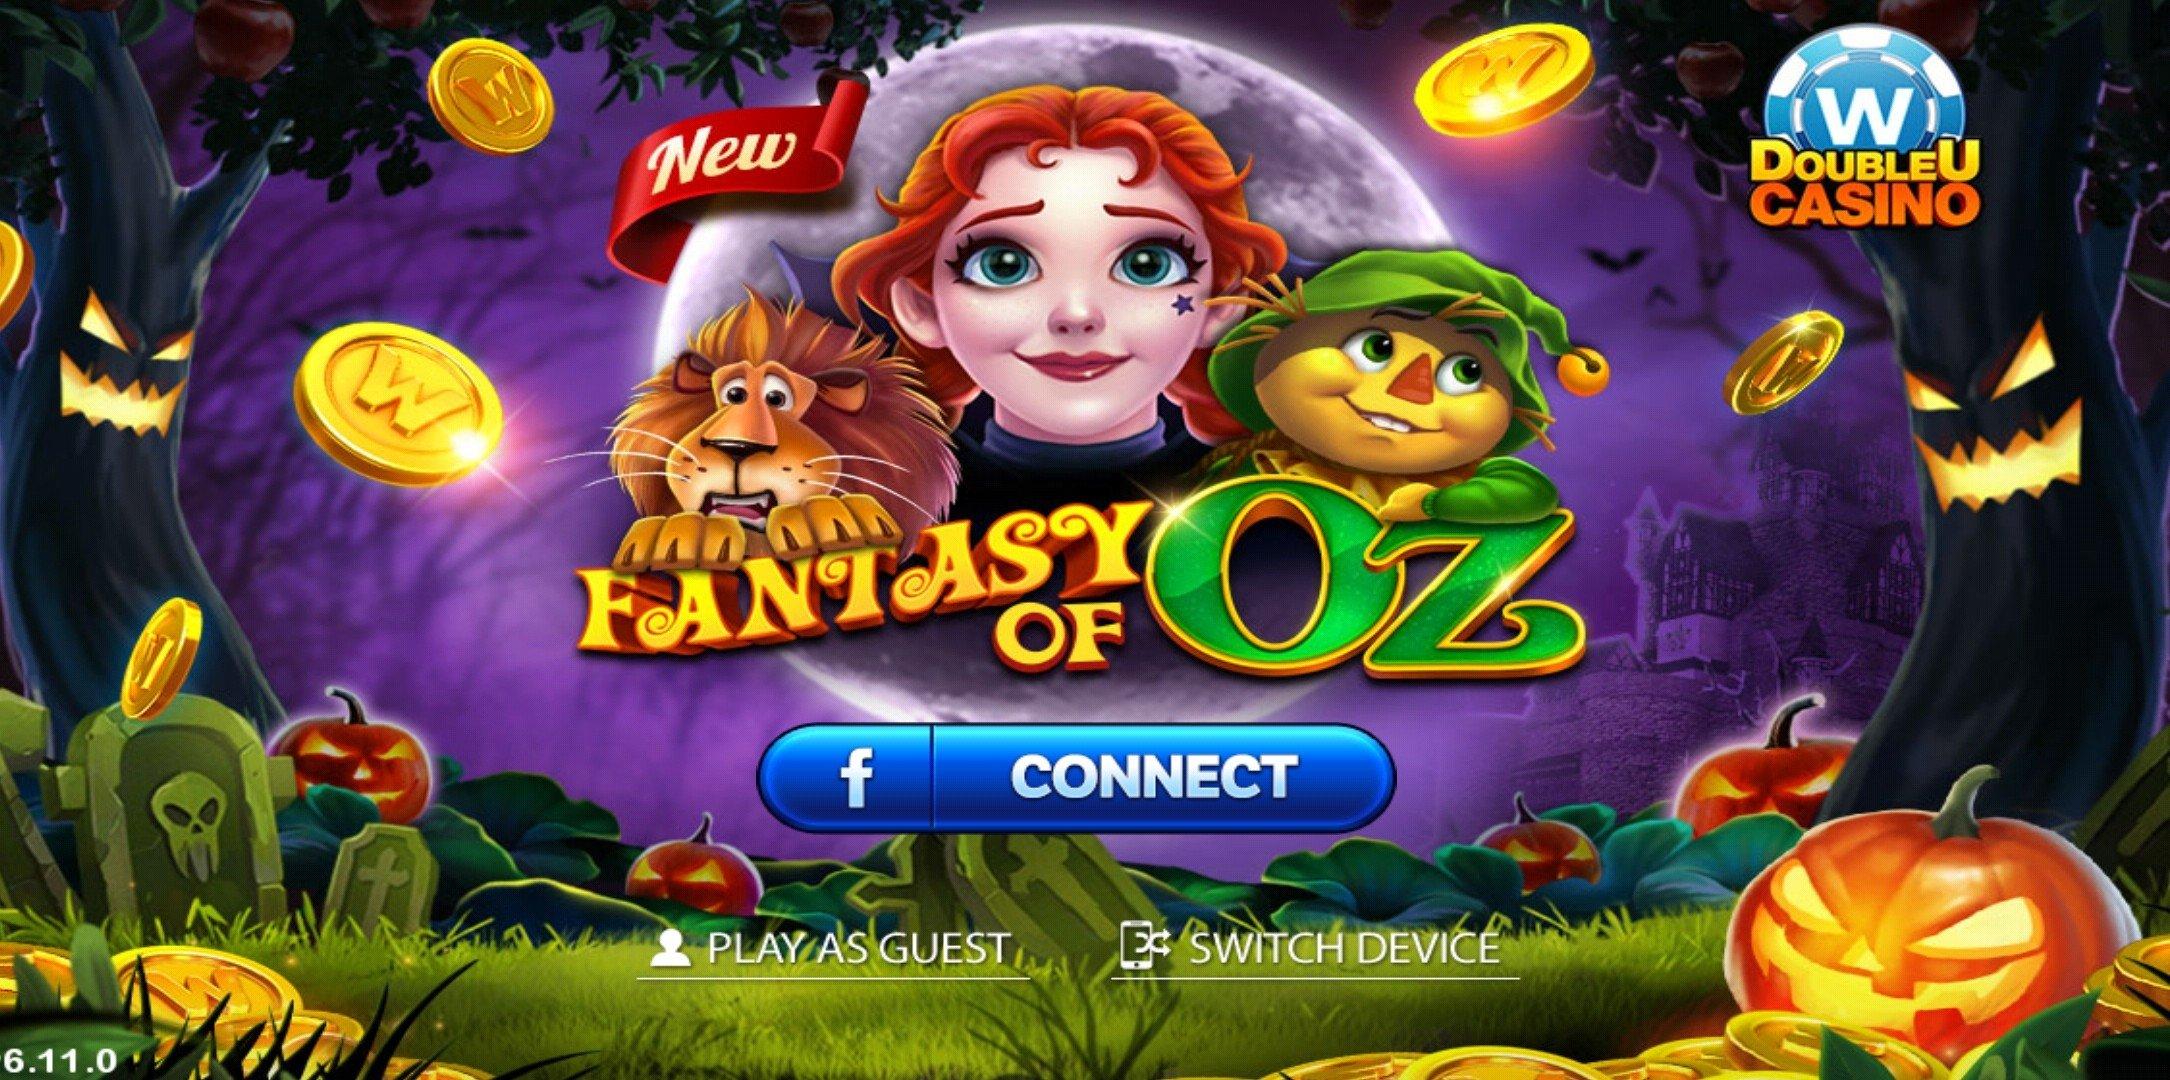 Riverbelle casino online canada